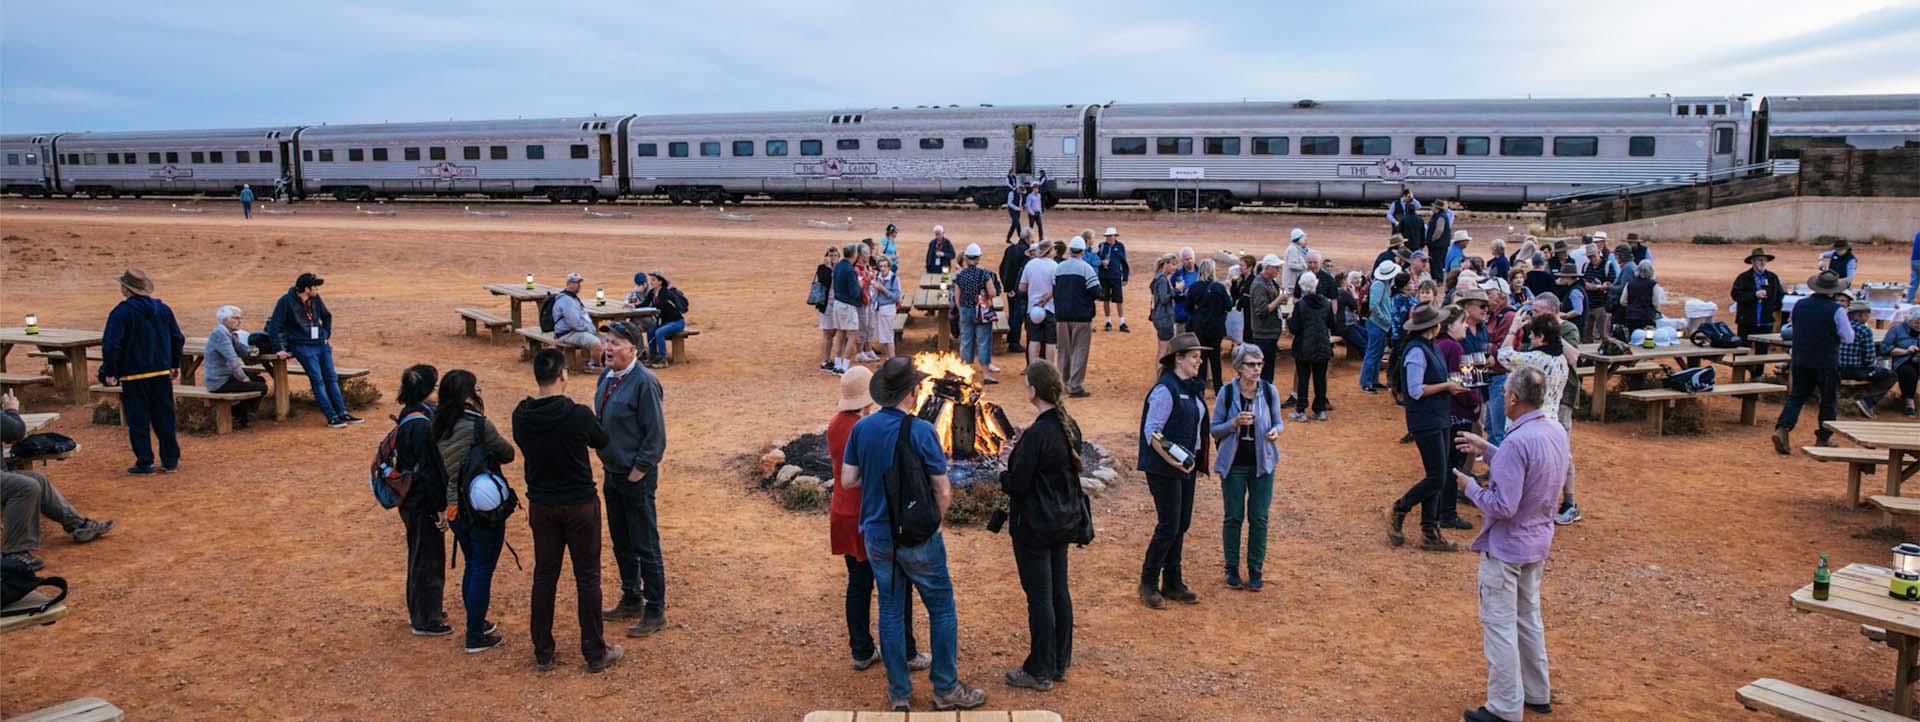 GHAN RAIL DEALS 2022 train picnic copy